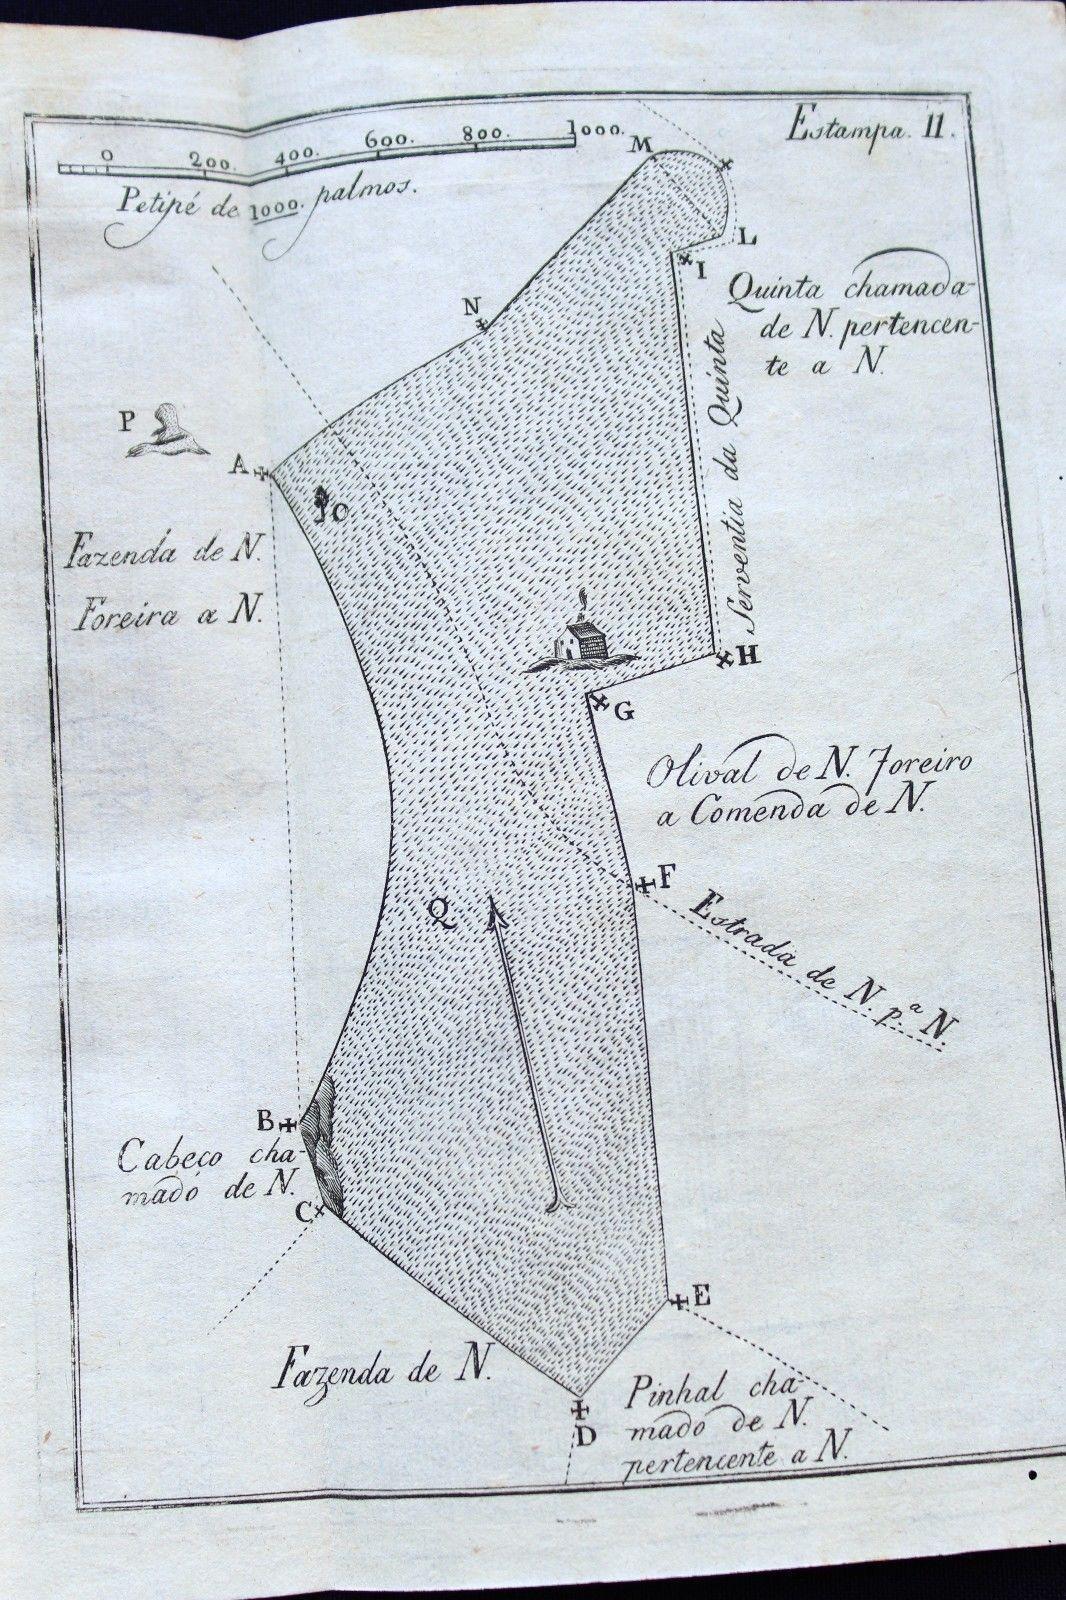 1806 Rare Monograph Land Demarcation Surveying Inheritances Law of Land